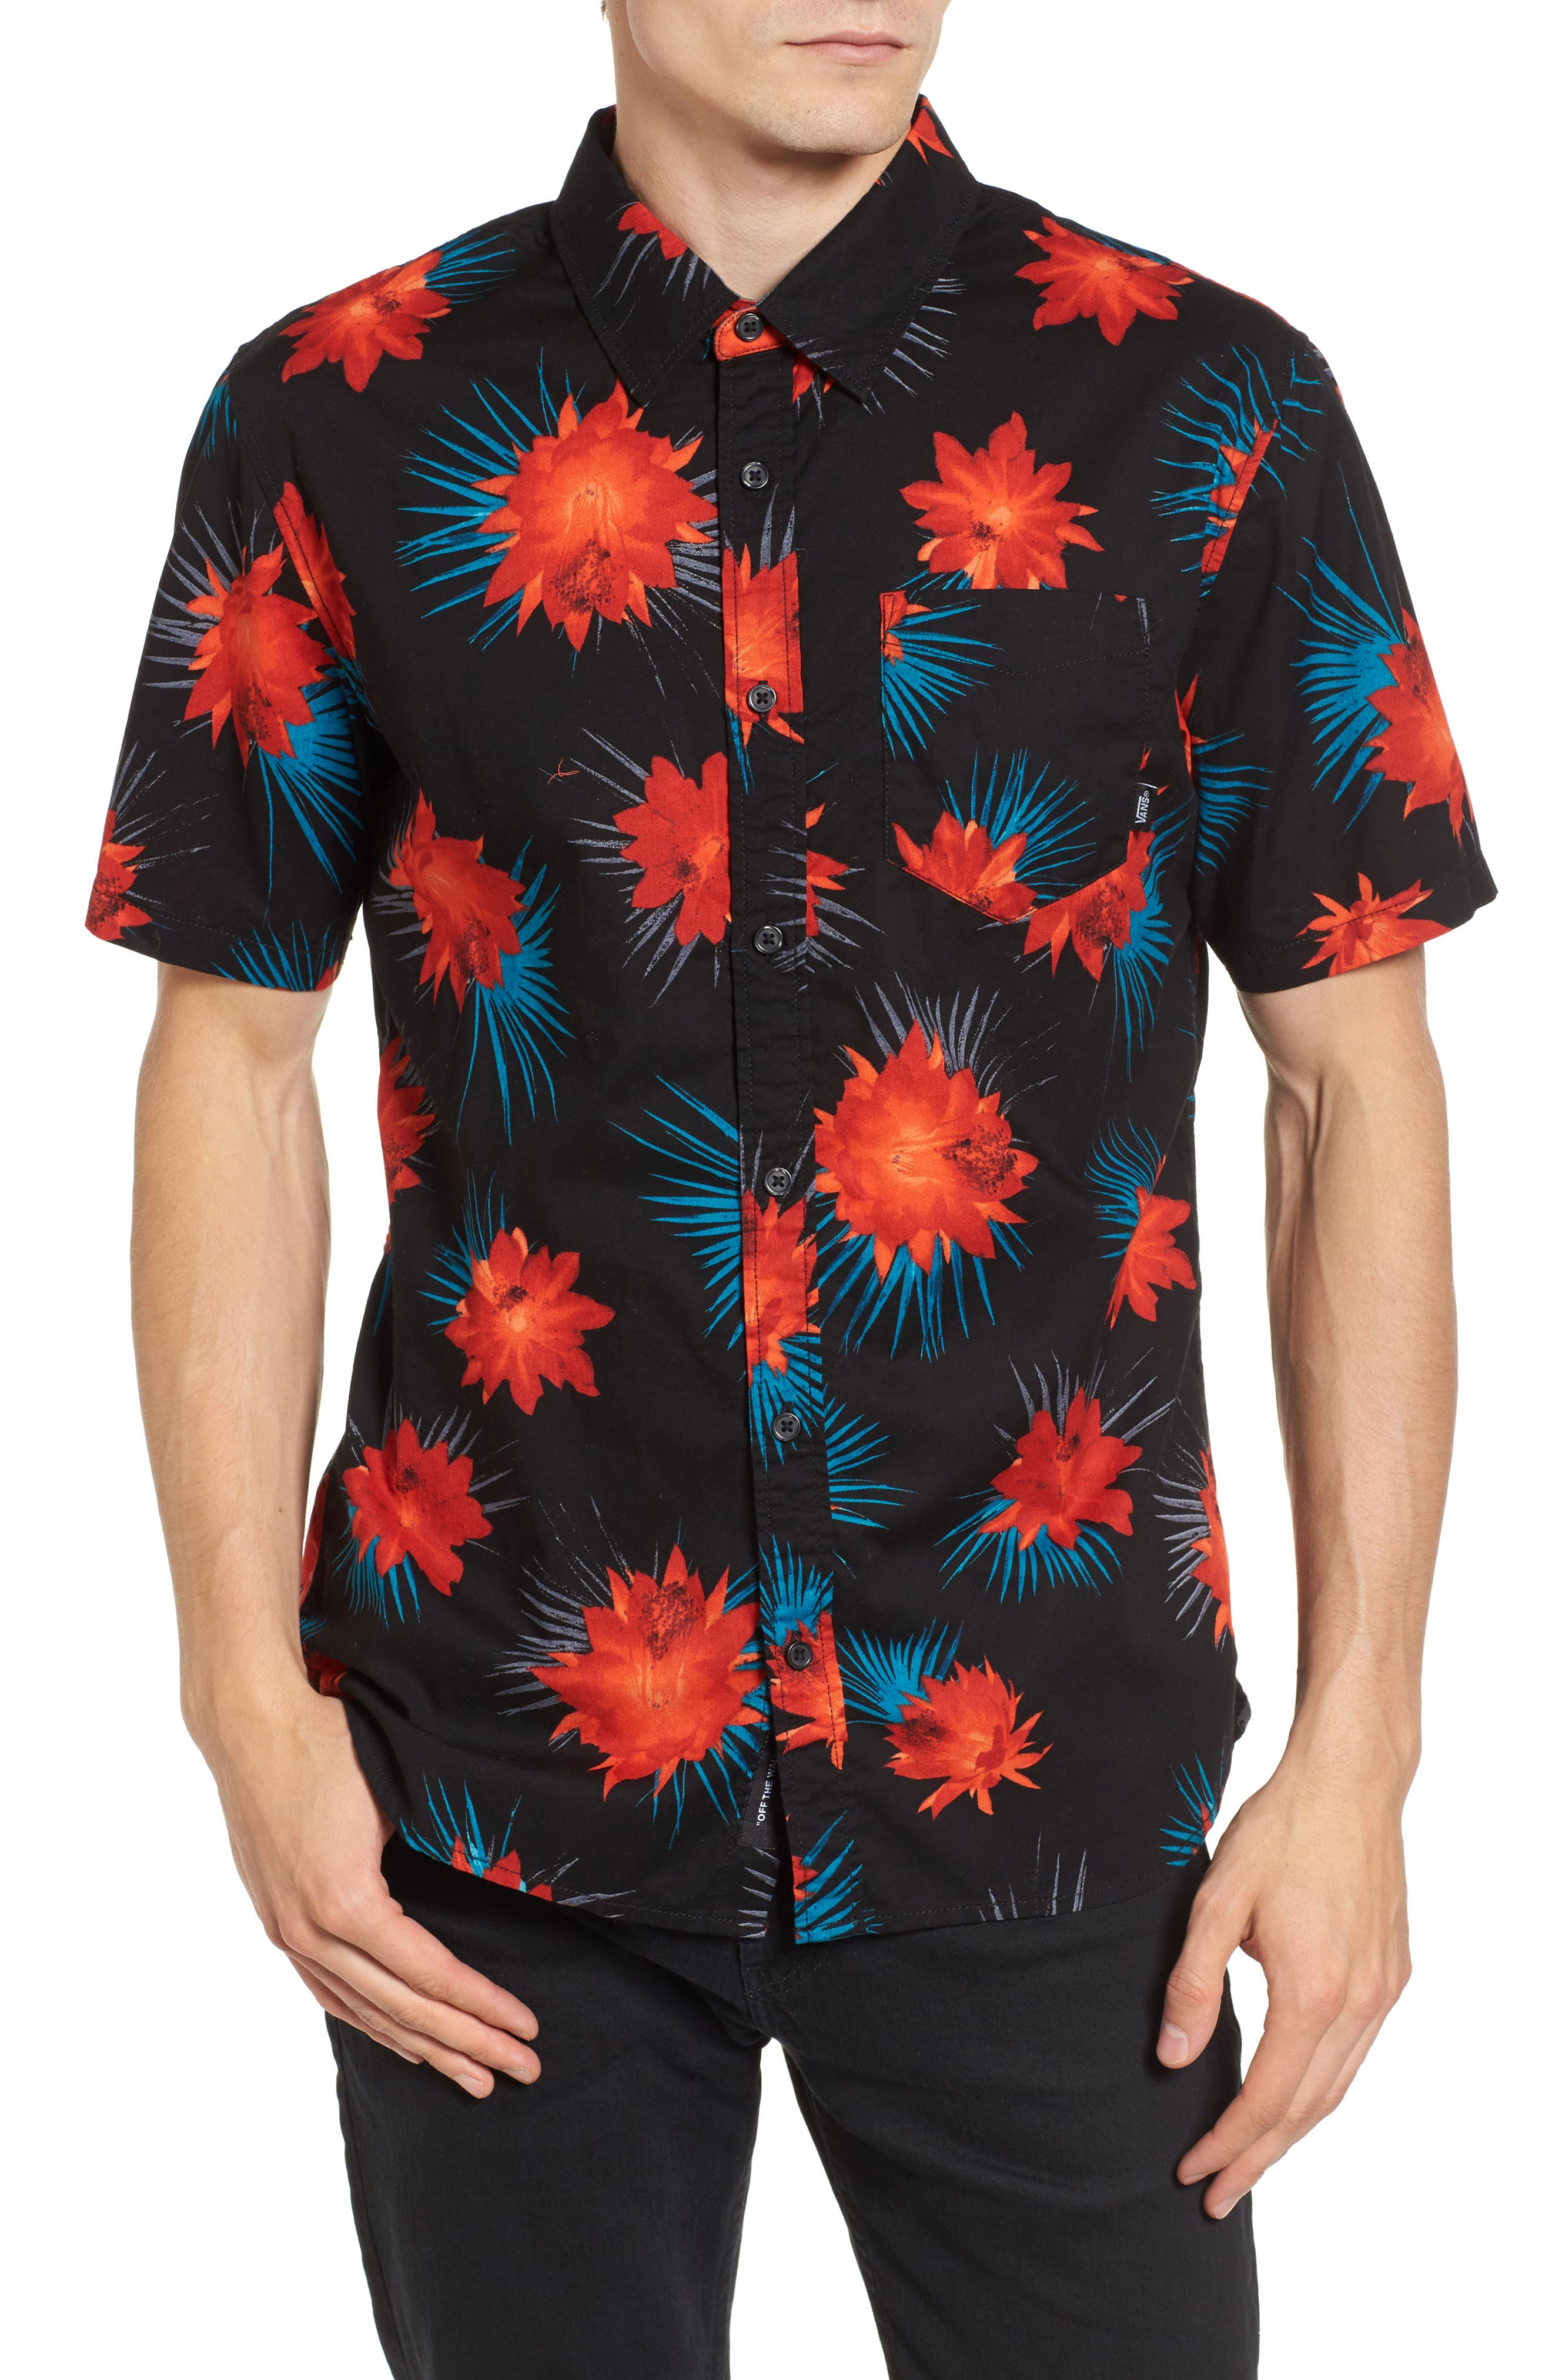 Cultivar Woven Shirt,                             Main thumbnail 1, color,                             Cactus Floral